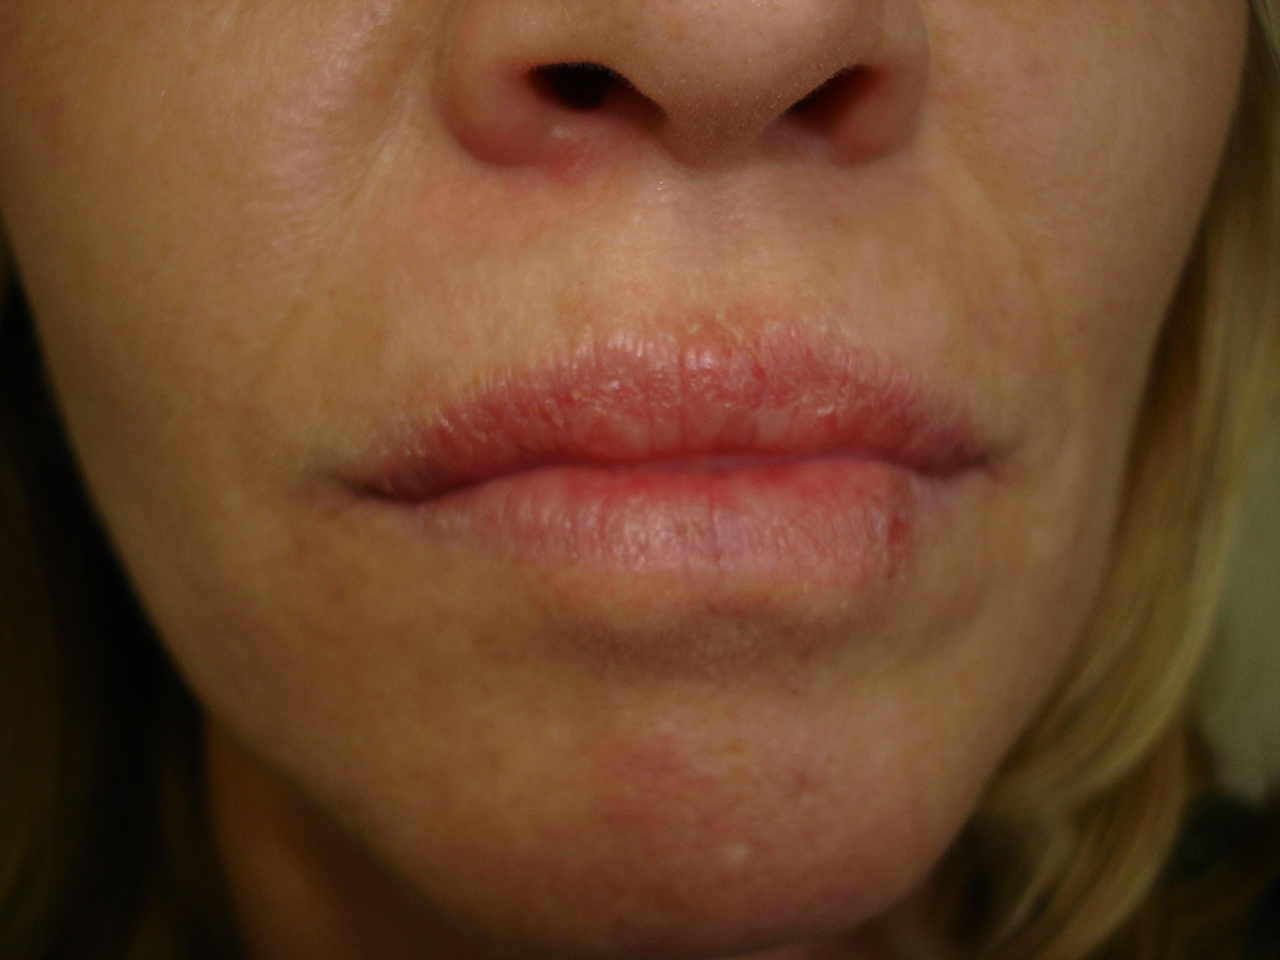 eczema on lip